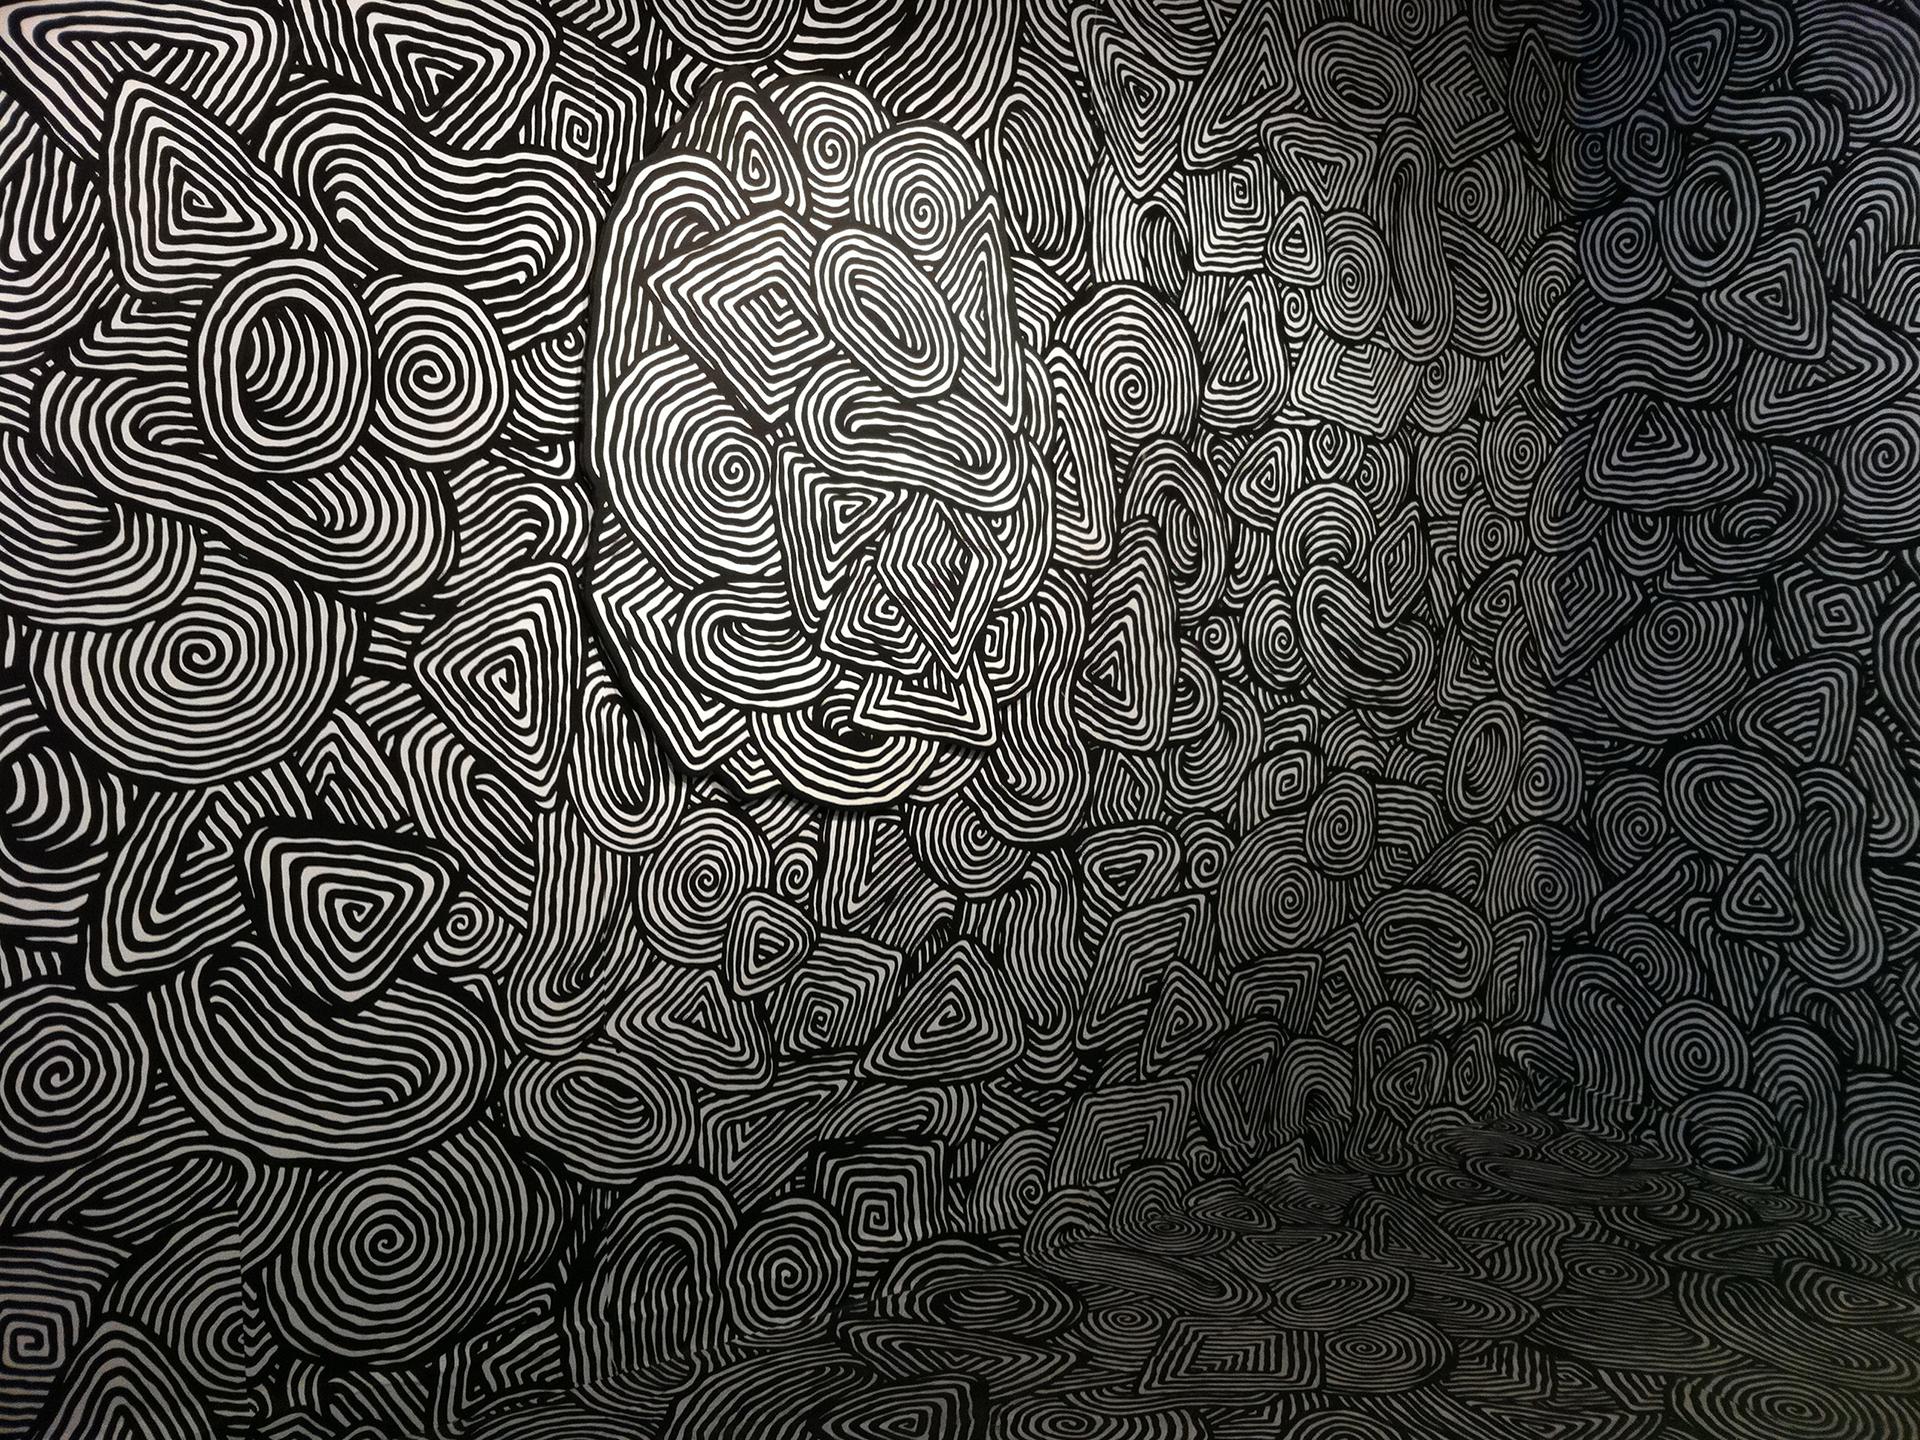 Pattern Texture Spiral Black White Design Wallpaper 1920x1440 Full 1920x1440